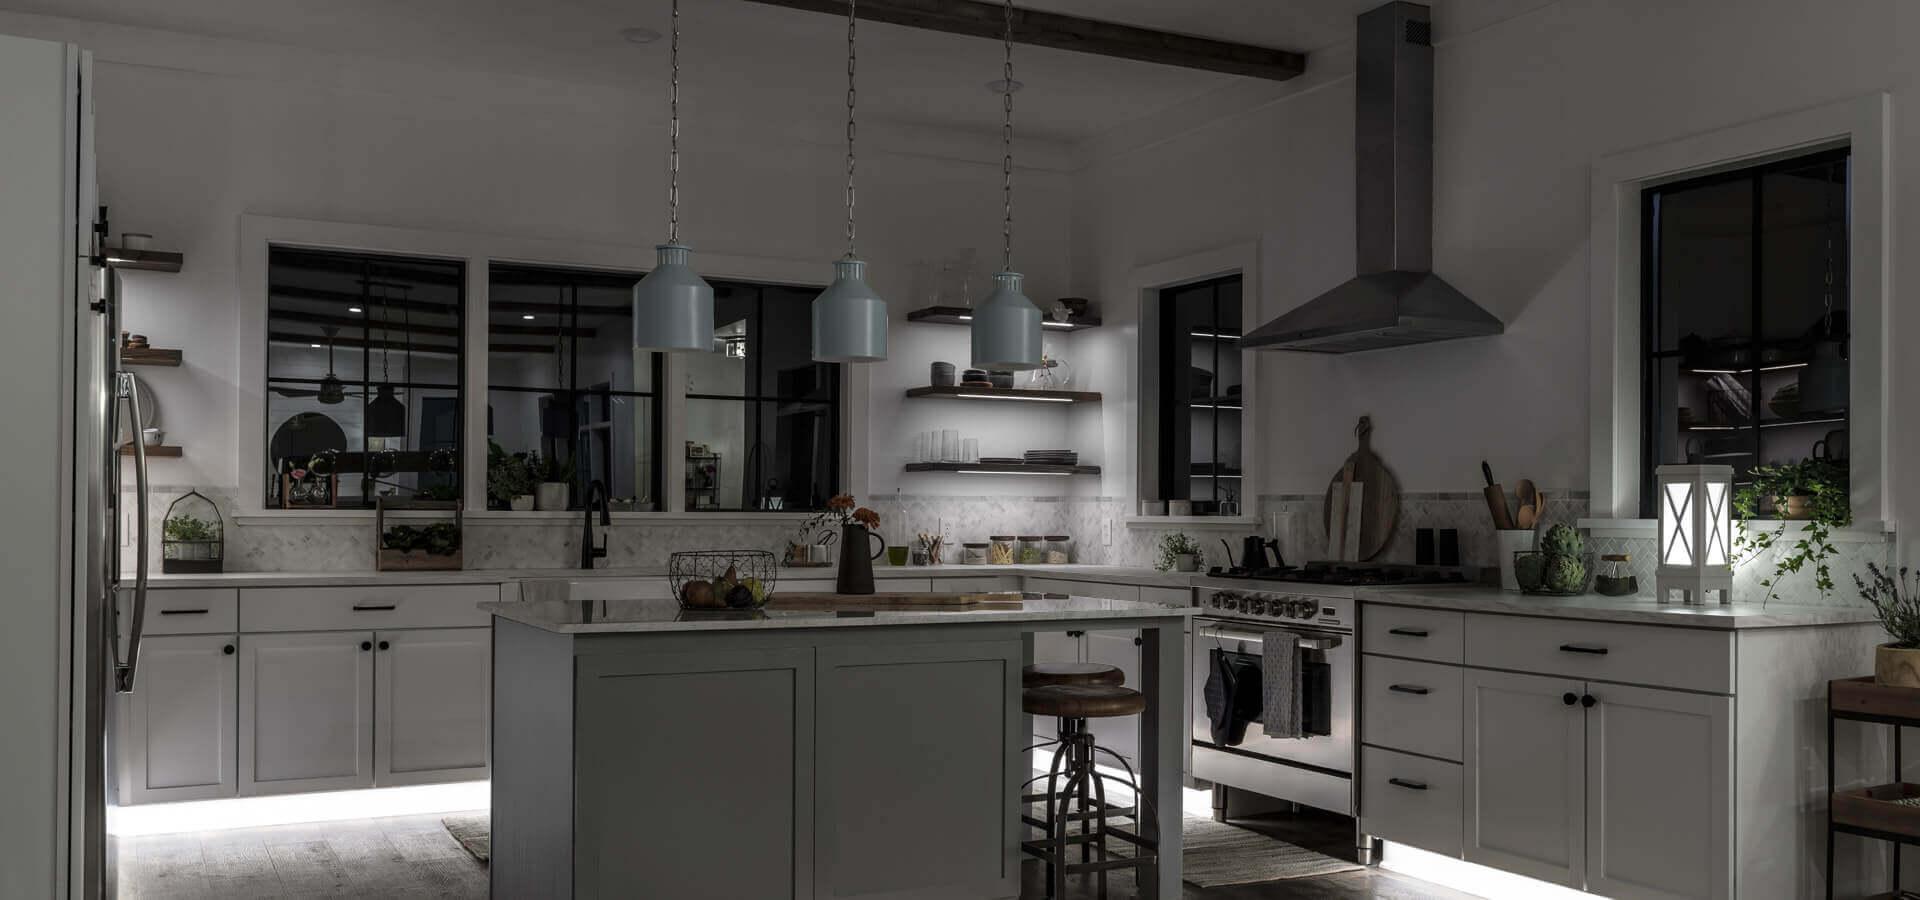 Kitchen Counter Decor Elegant